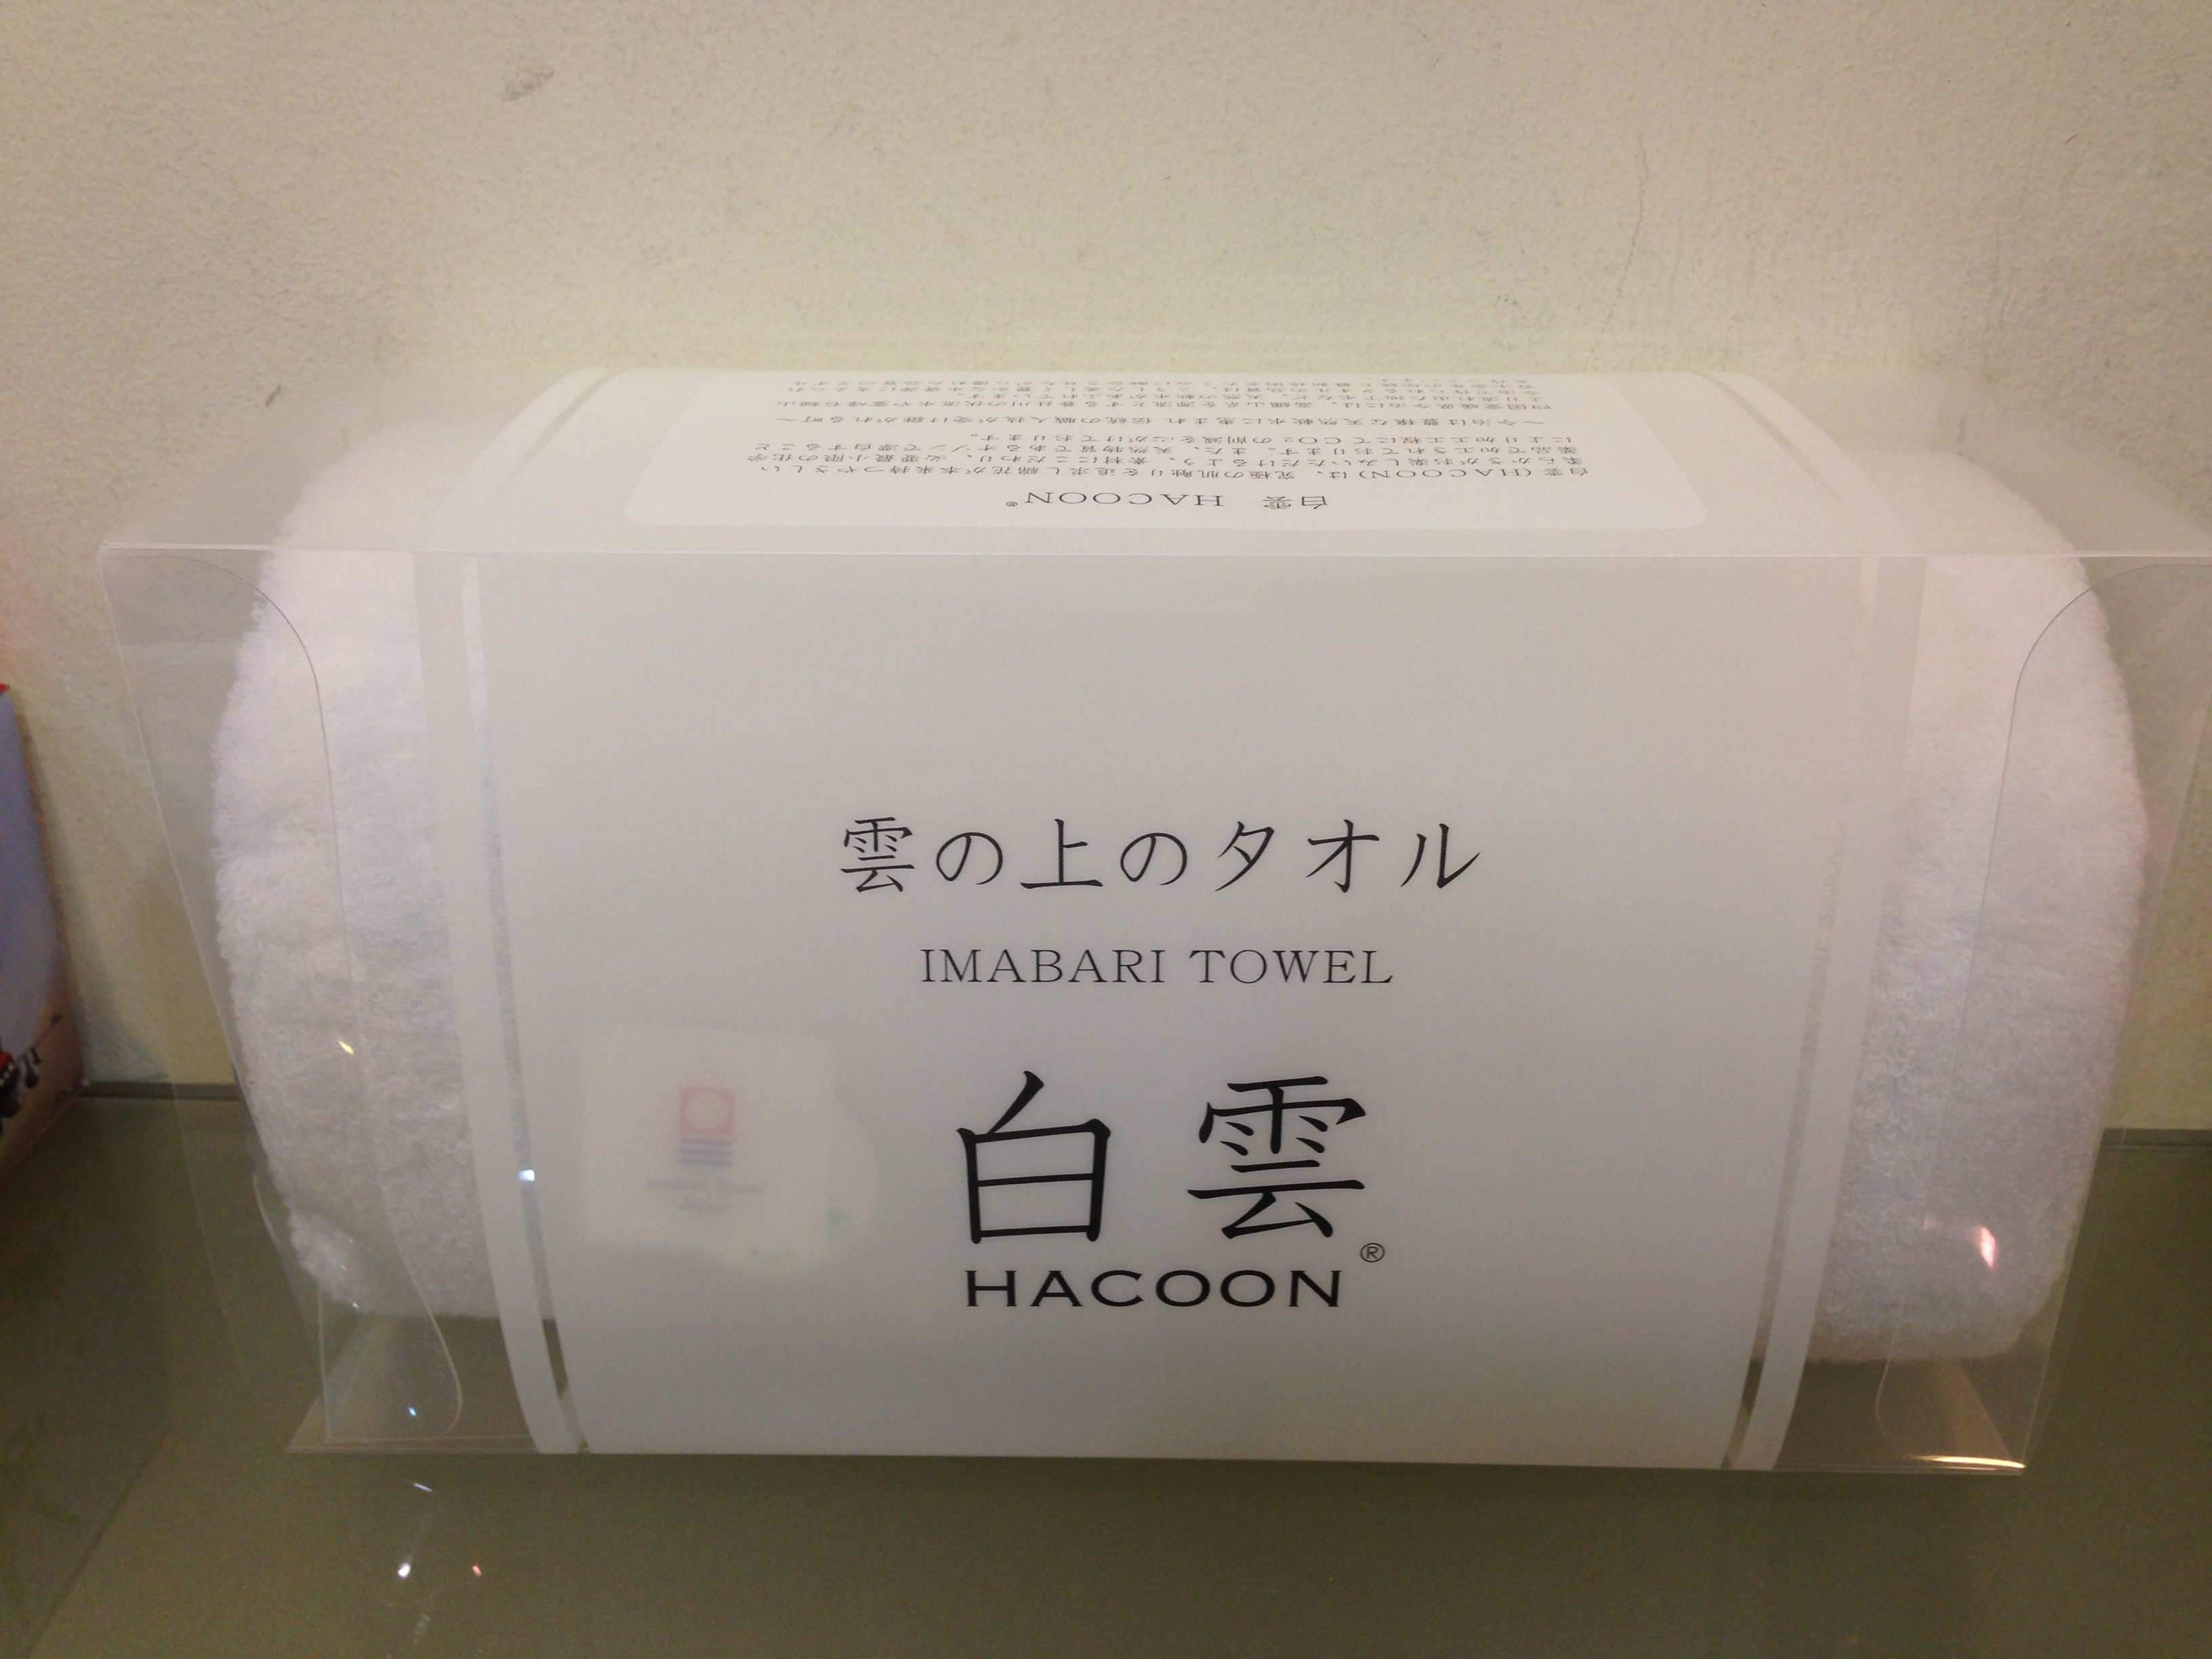 yamako3.11 194